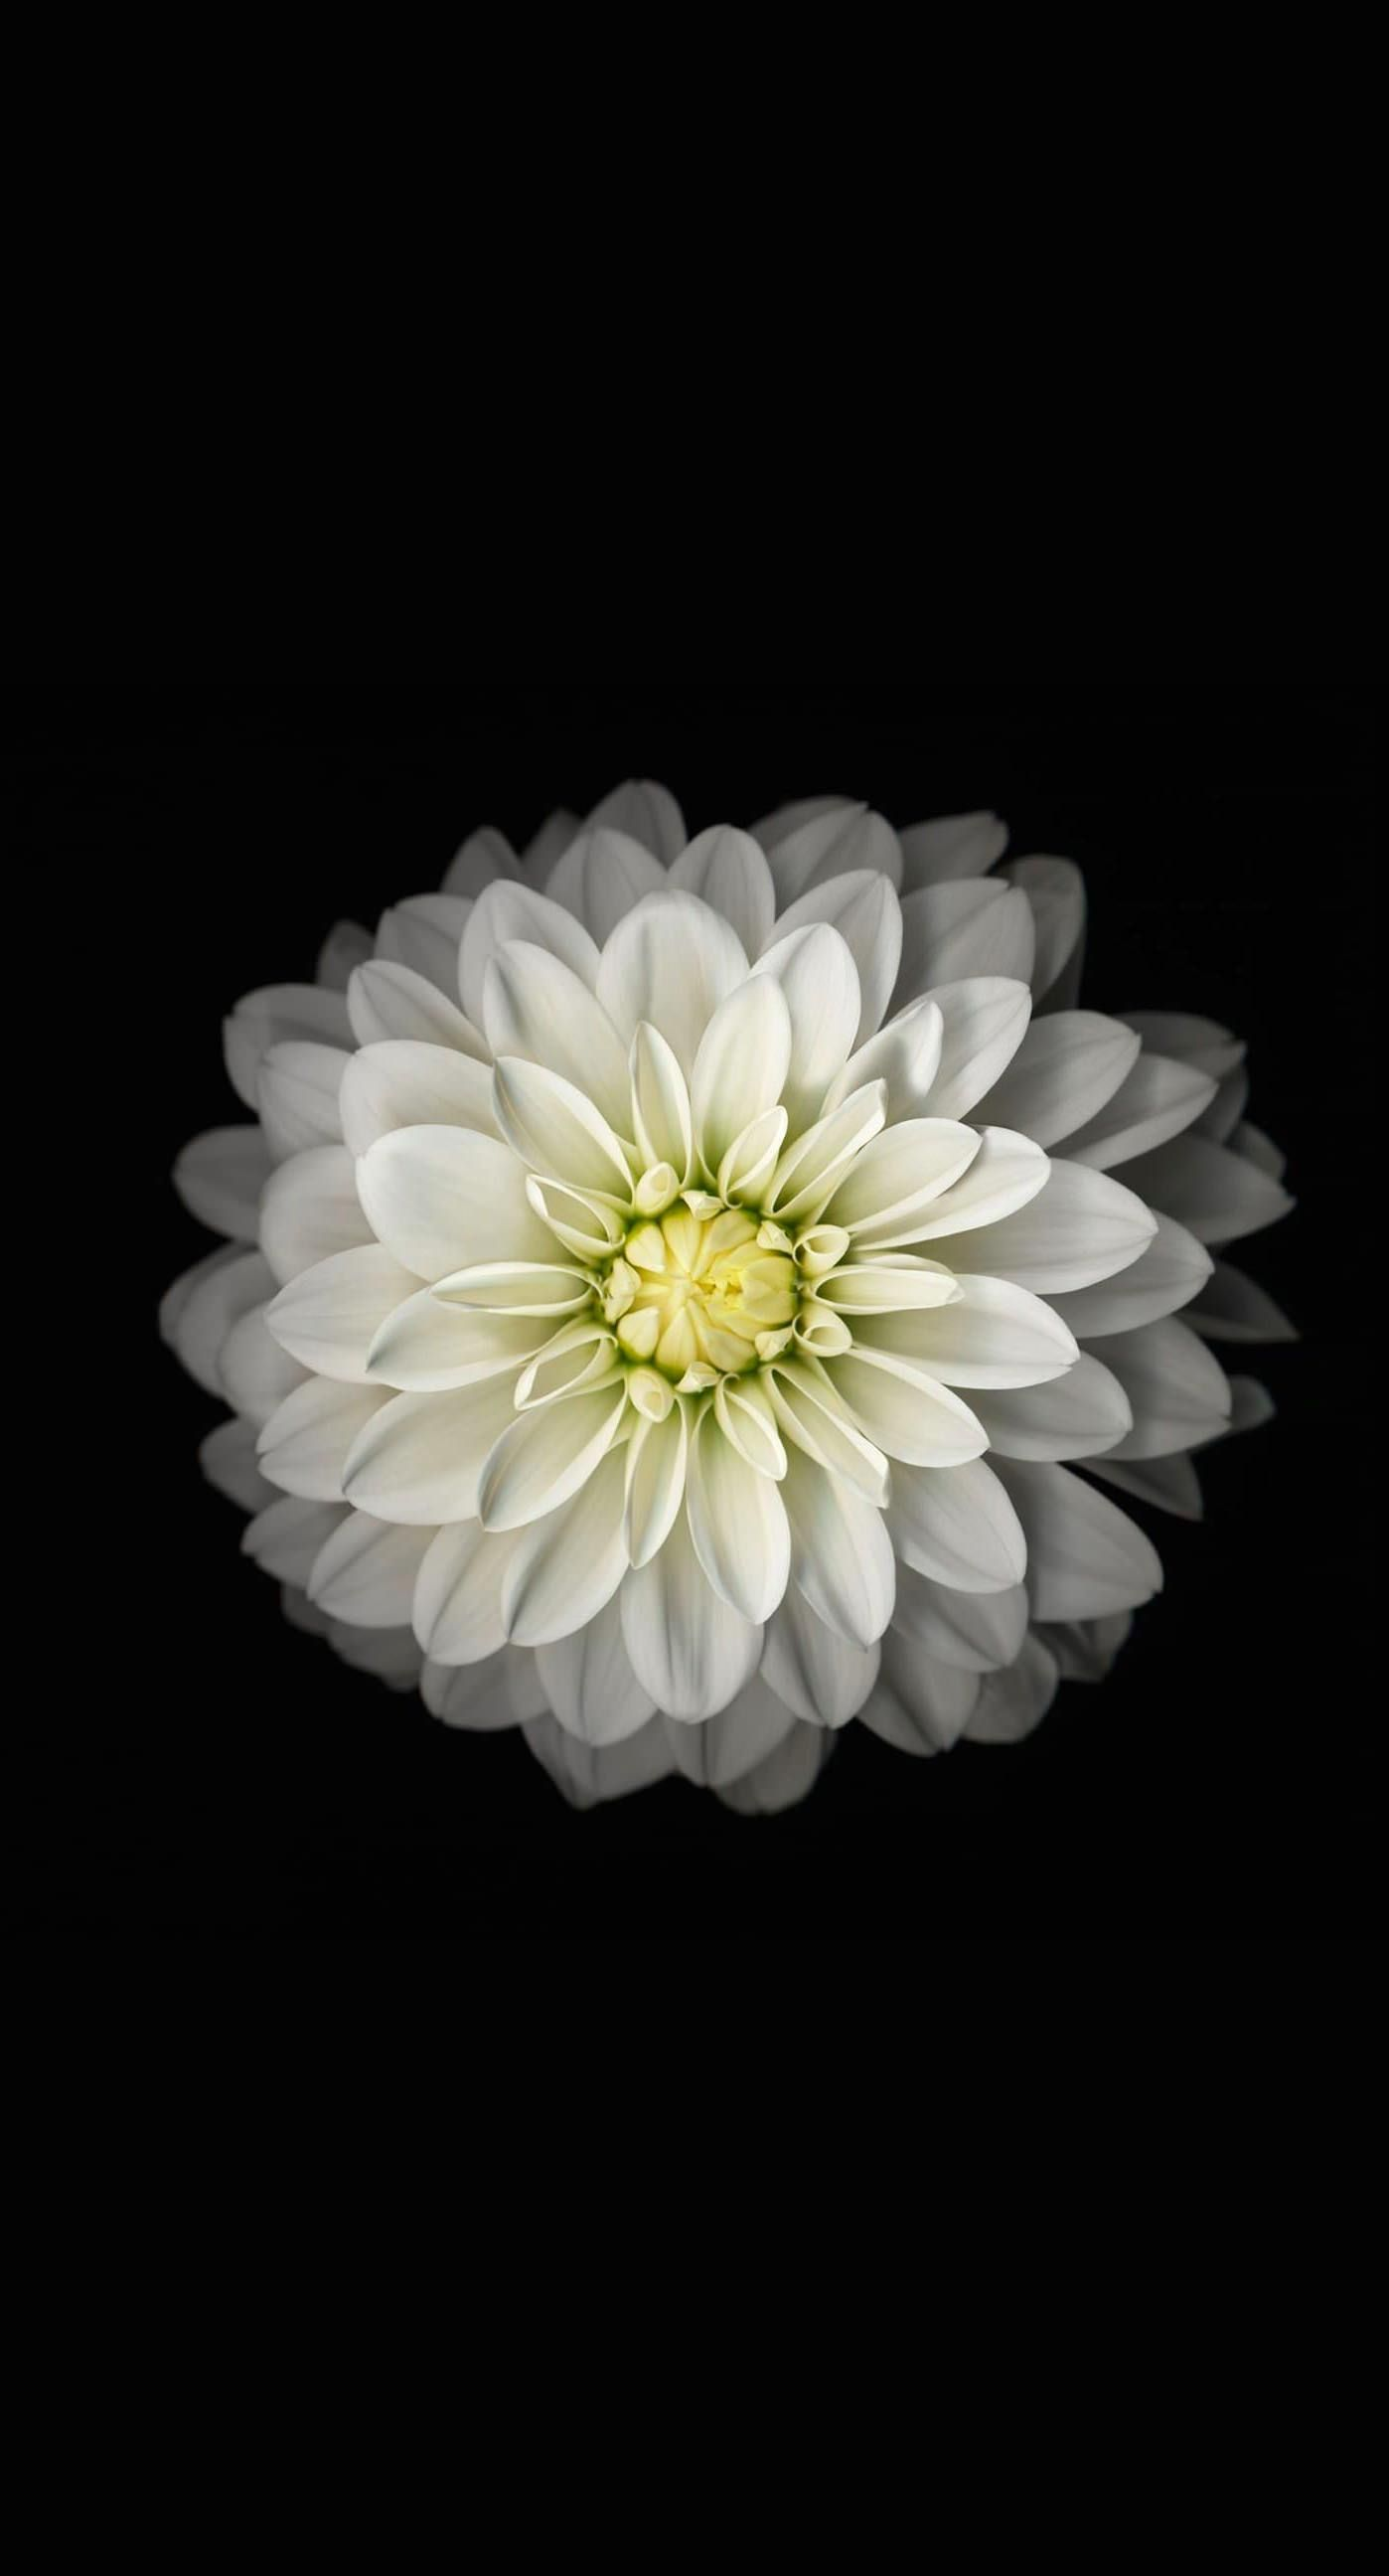 White Flower iPhone Wallpapers on WallpaperDog